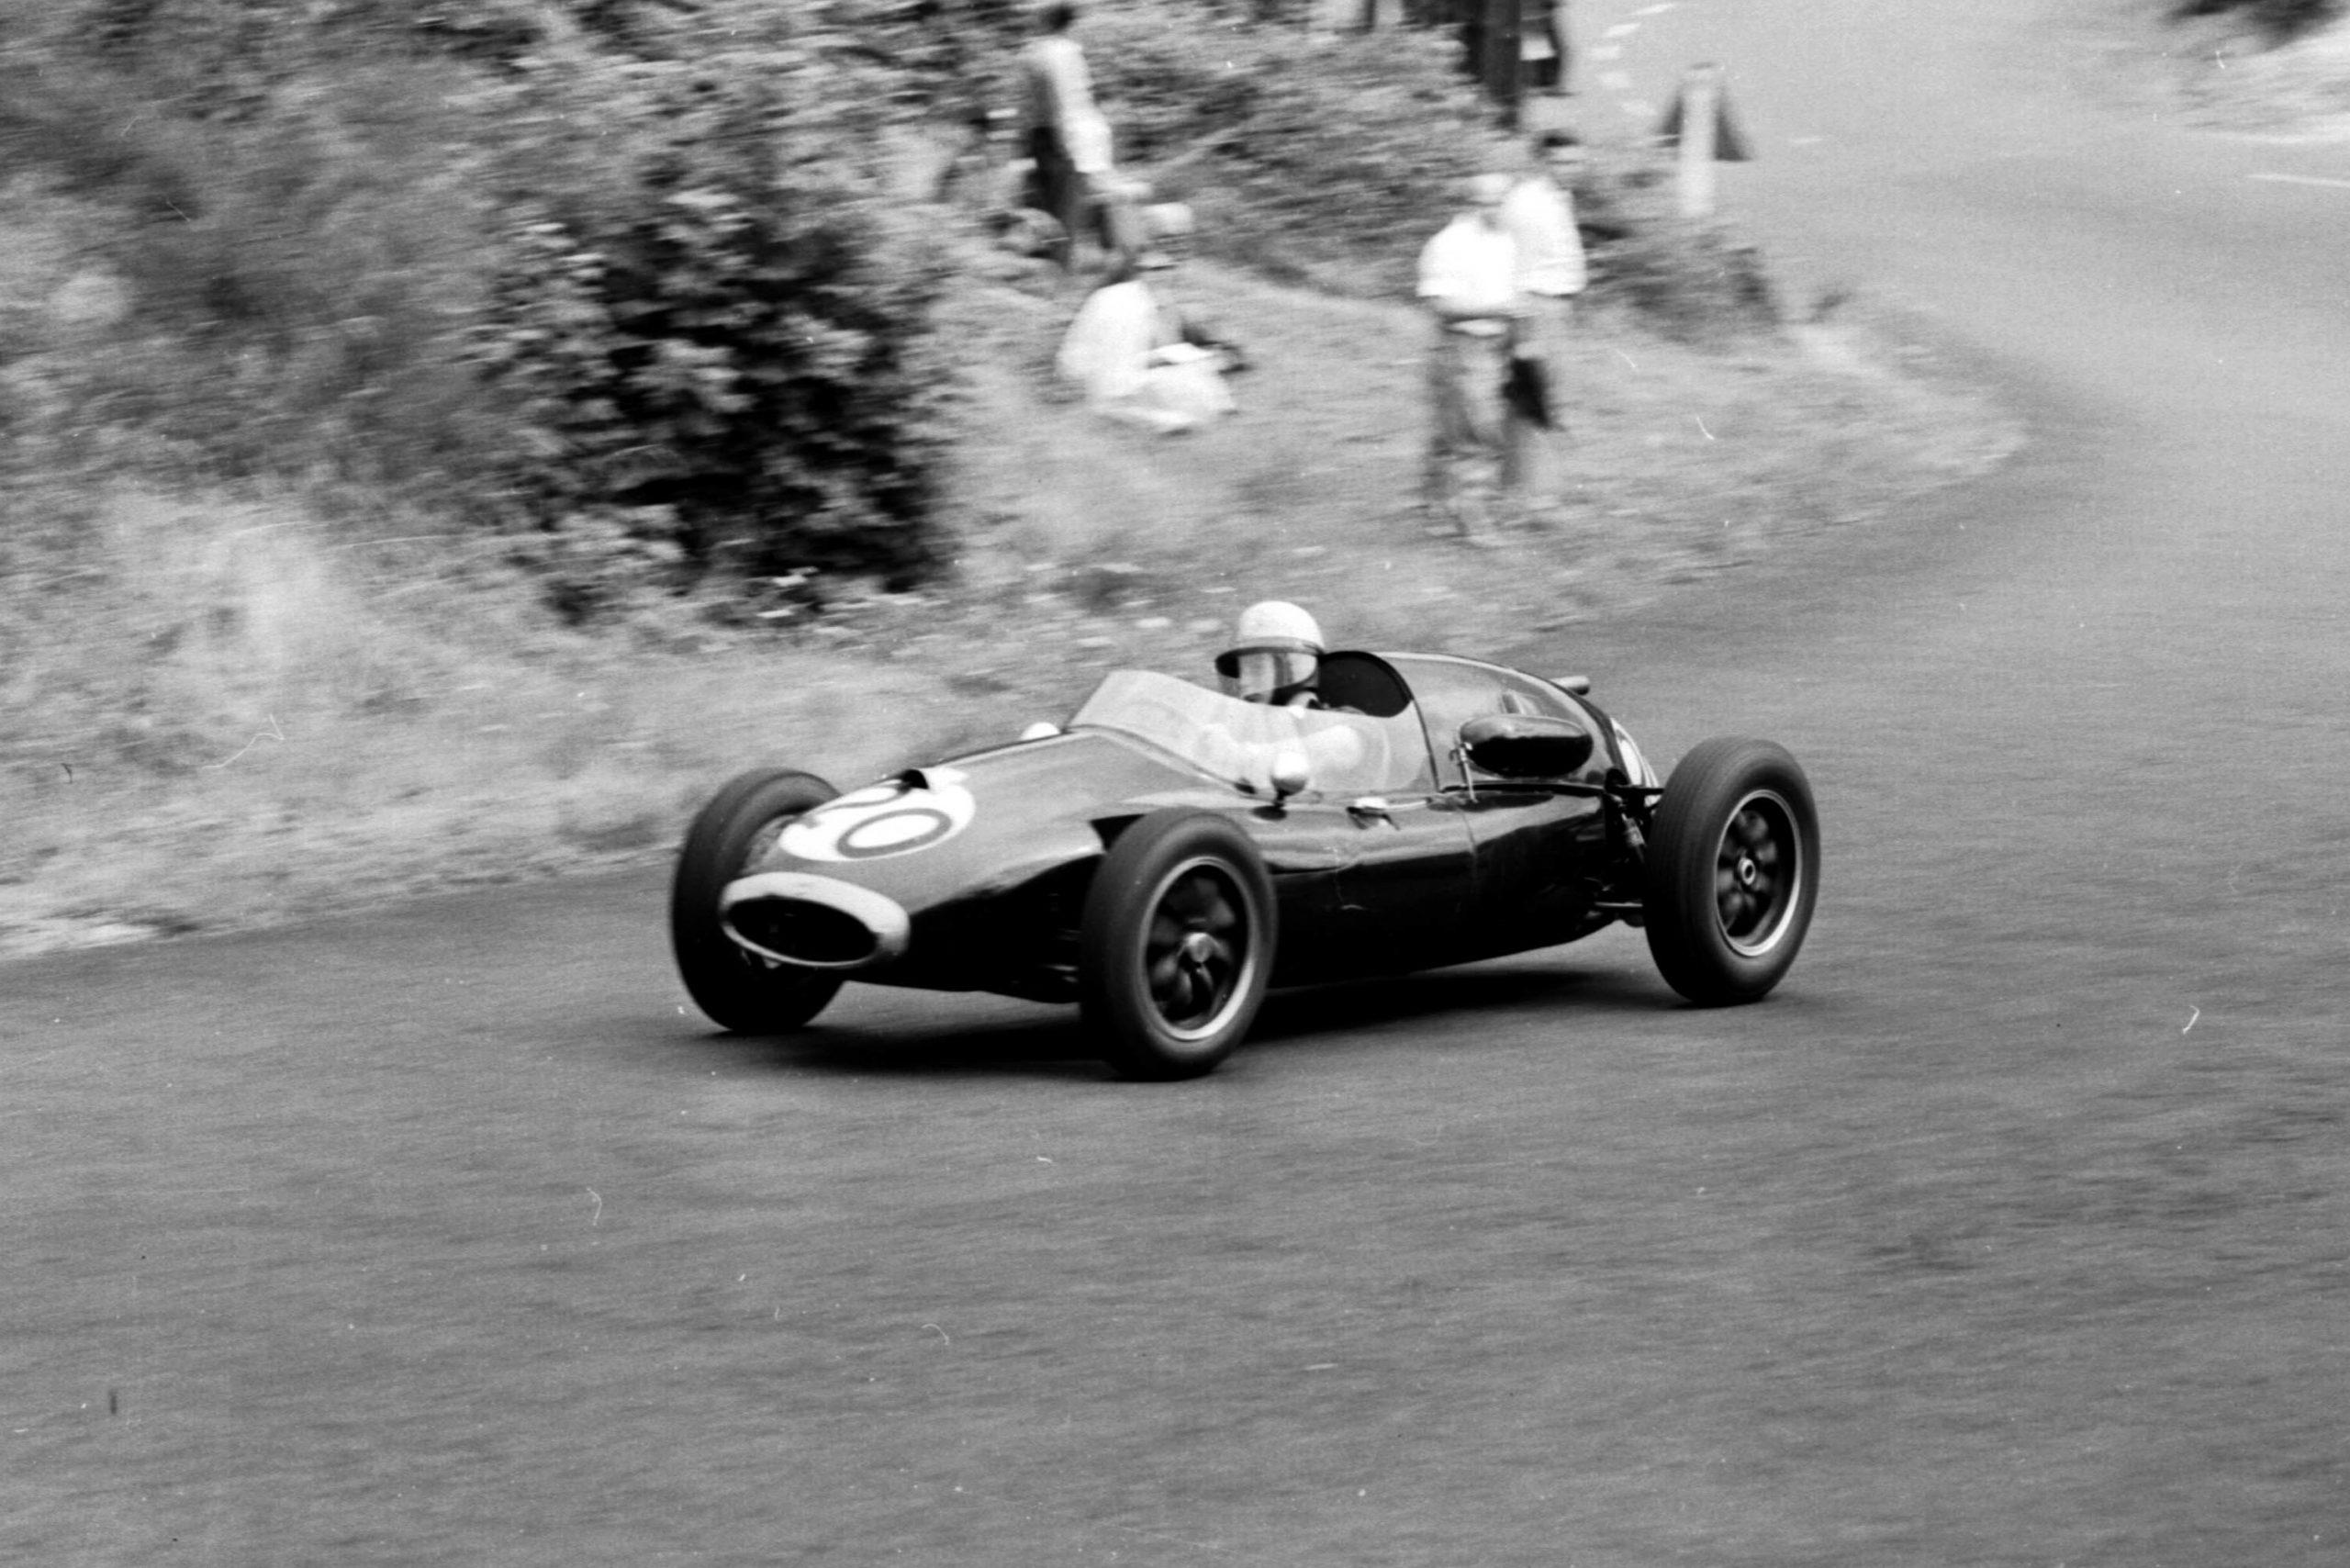 Bruce McLaren driving a Cooper T45-Climax